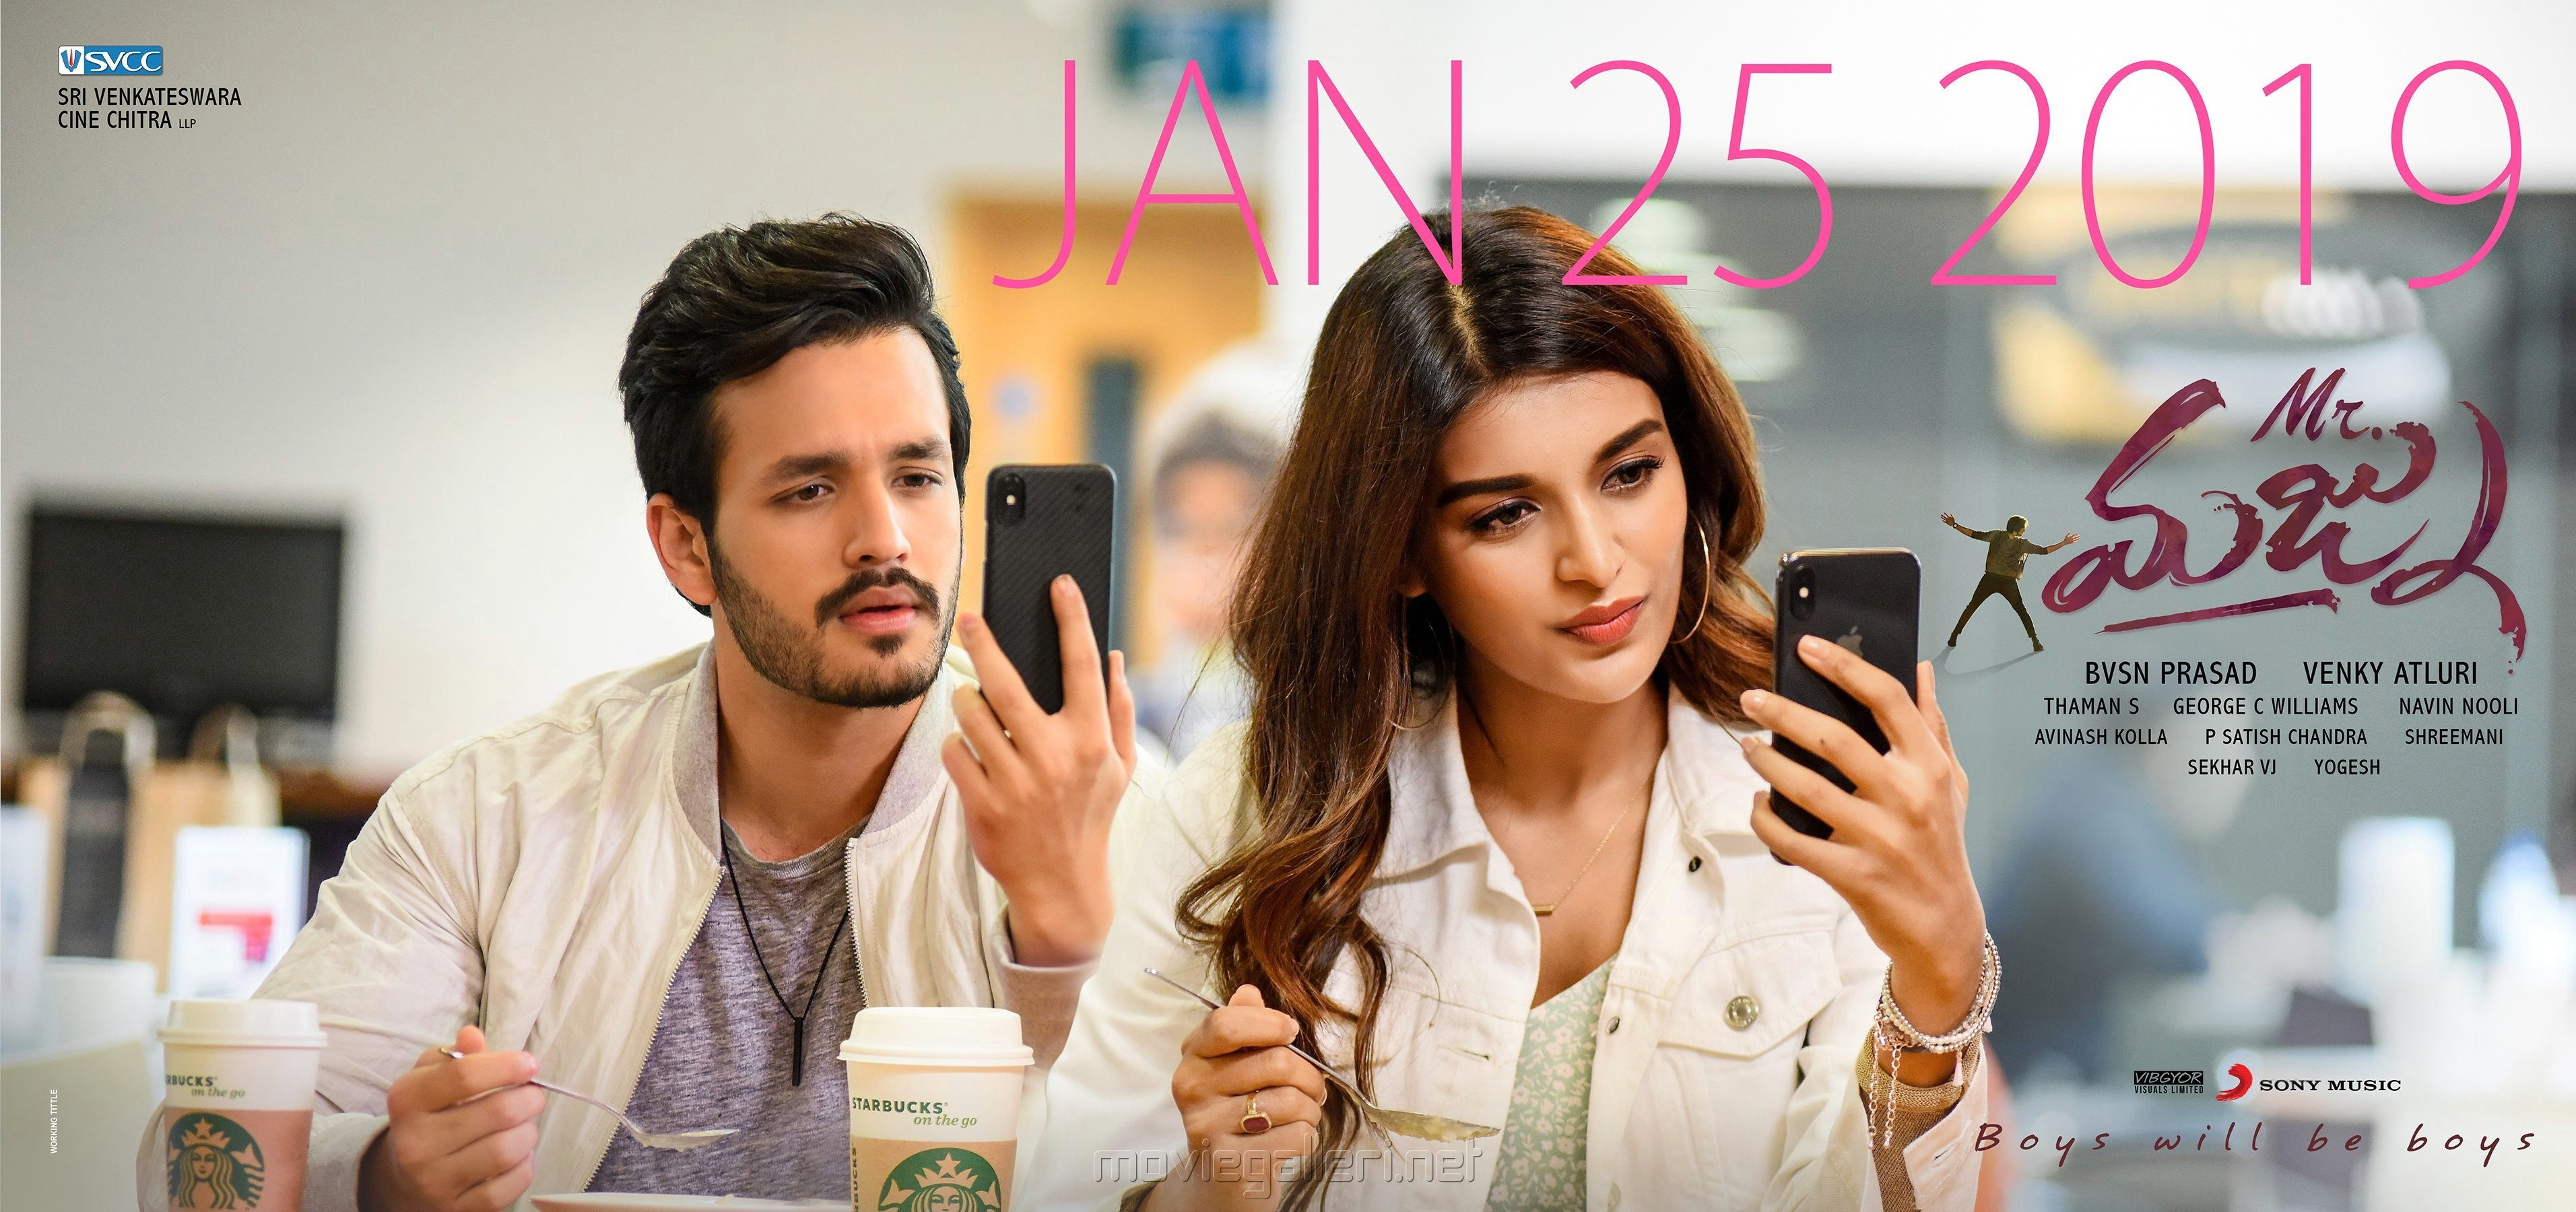 Akhil Akkineni Nidhi Agarwal Mr Majnu Movie Release Date 25th January 2019 Wallpapers HD